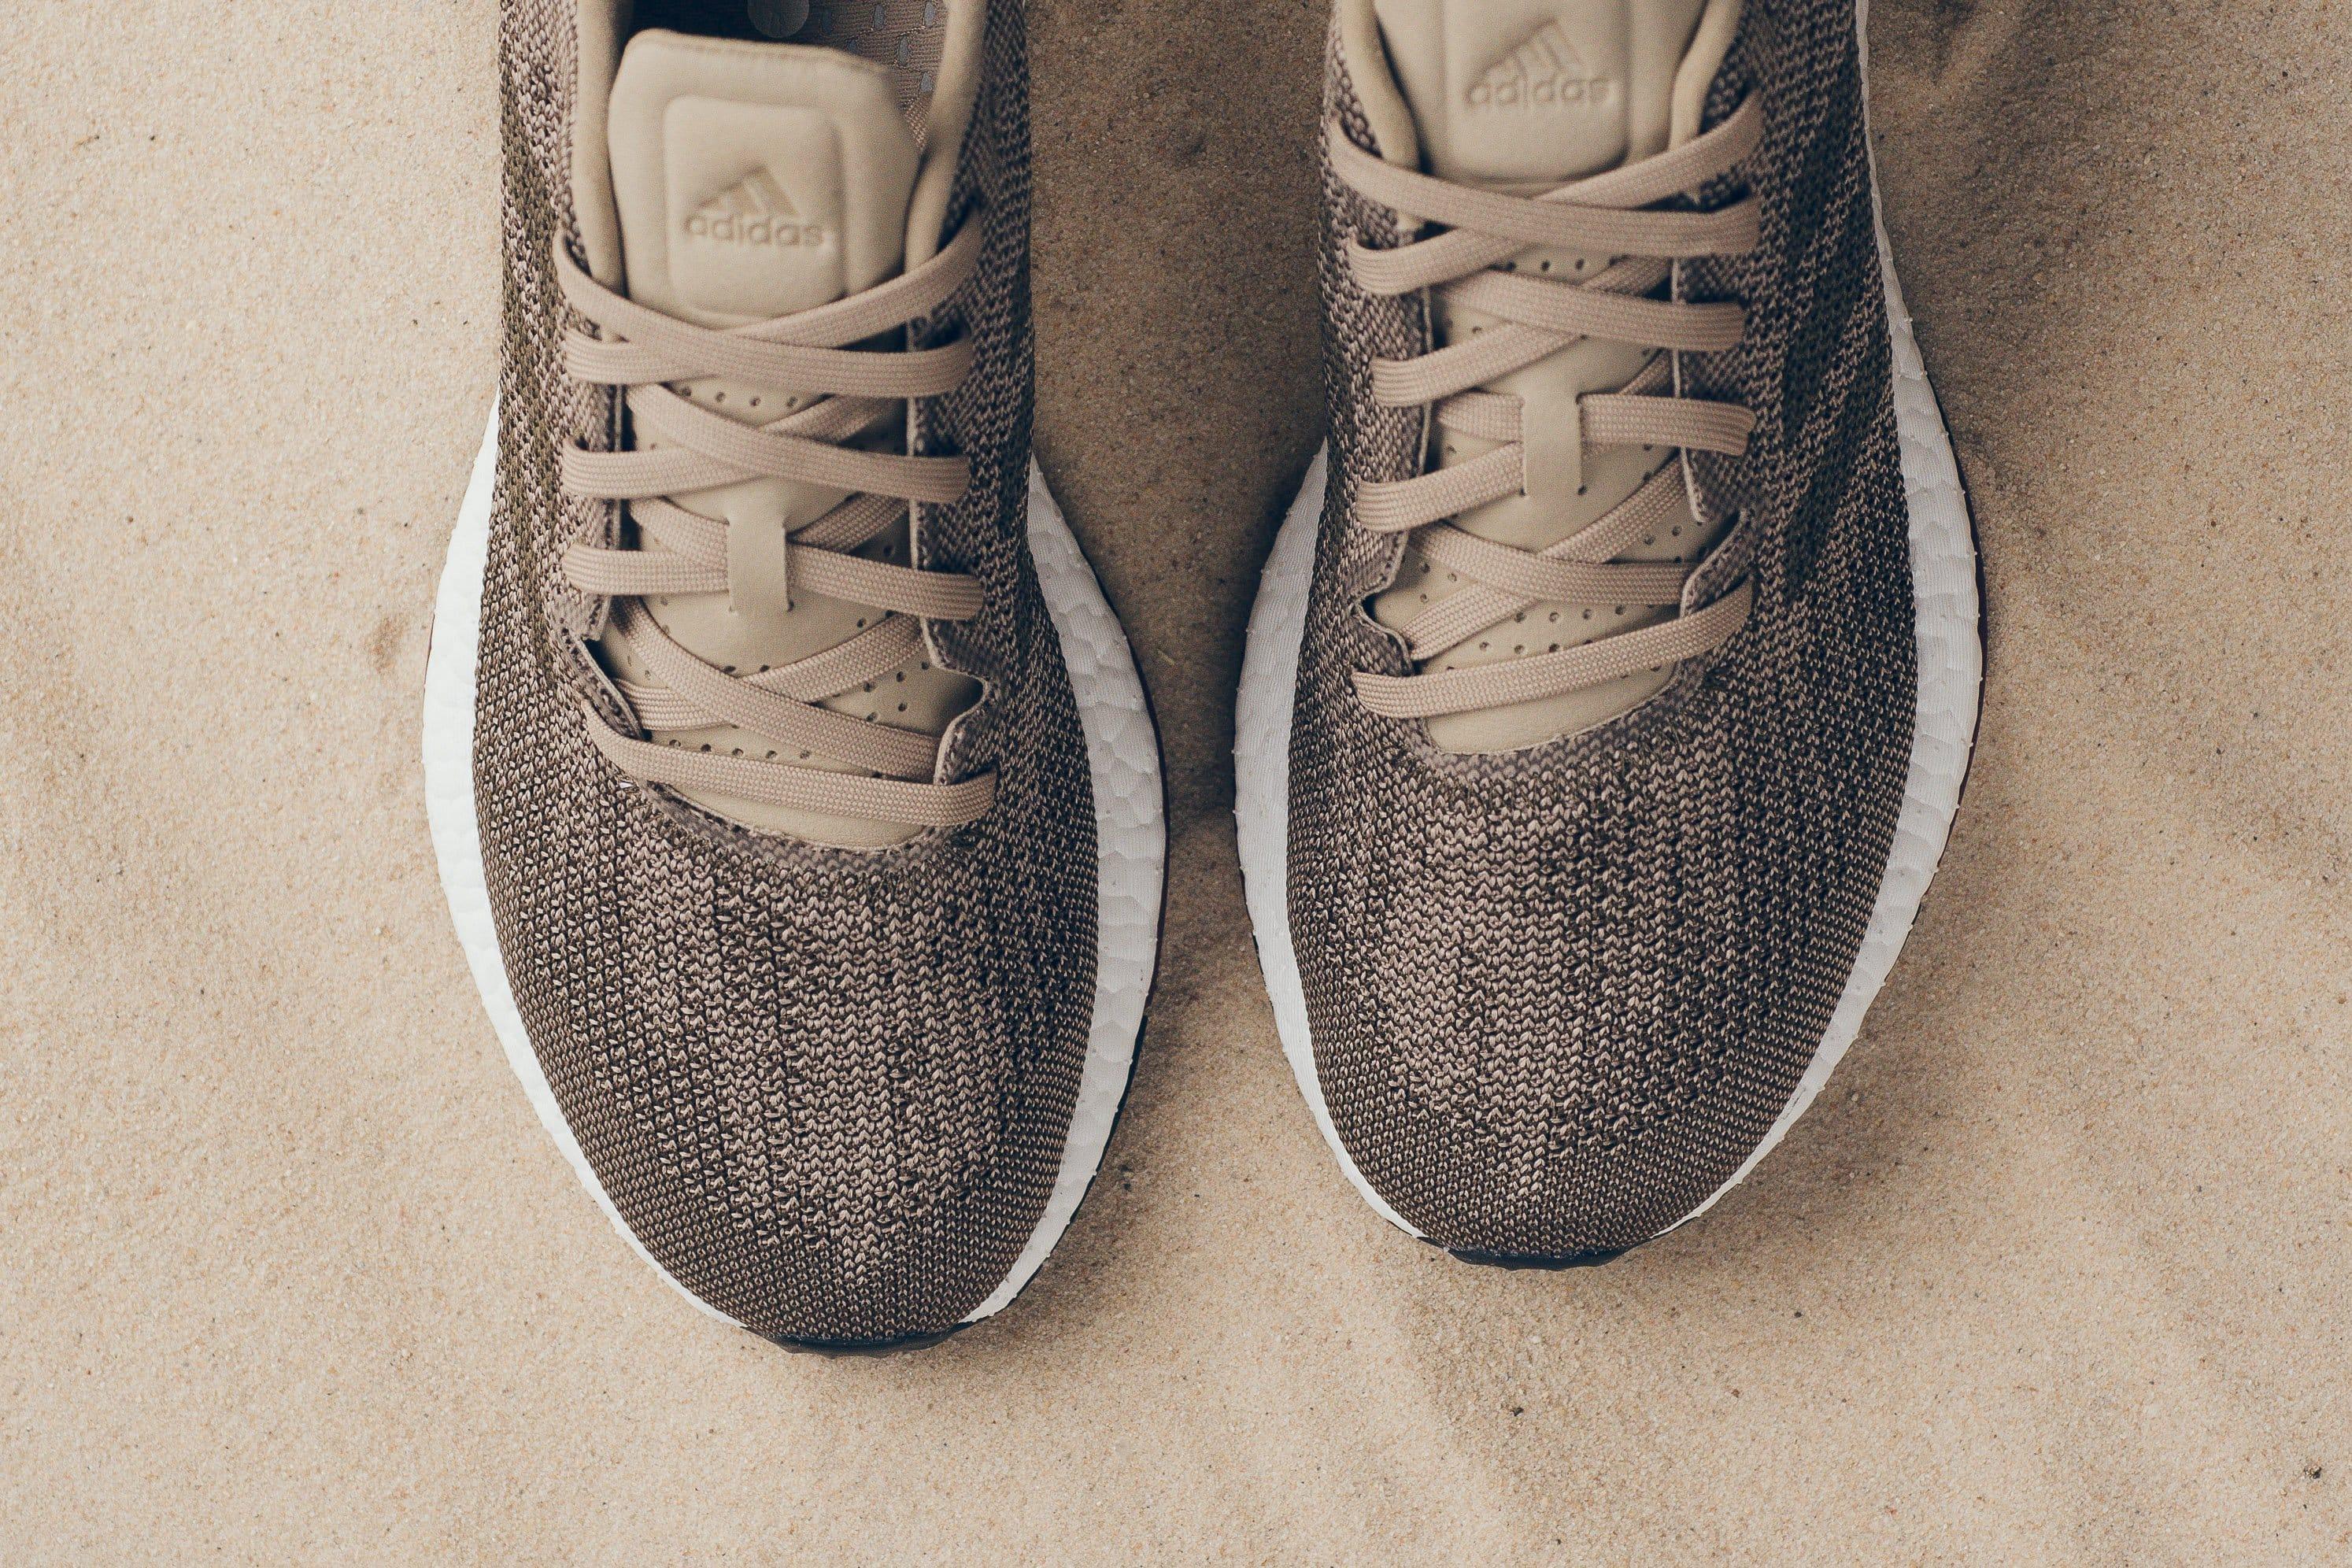 adidas PureBOOST DPR Tan and Black